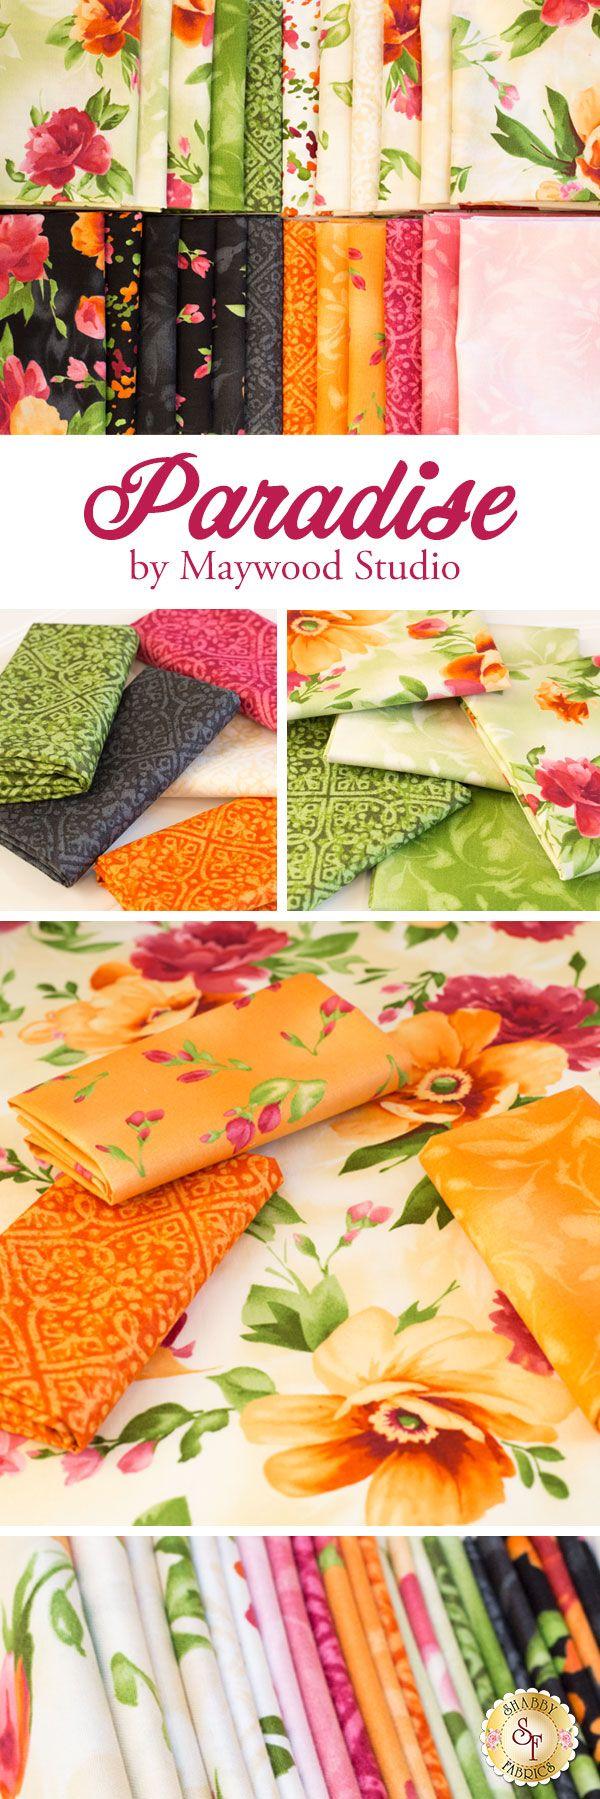 Paradise from Maywood Studio Fabrics is a beautiful collection available at Shabby Fabrics